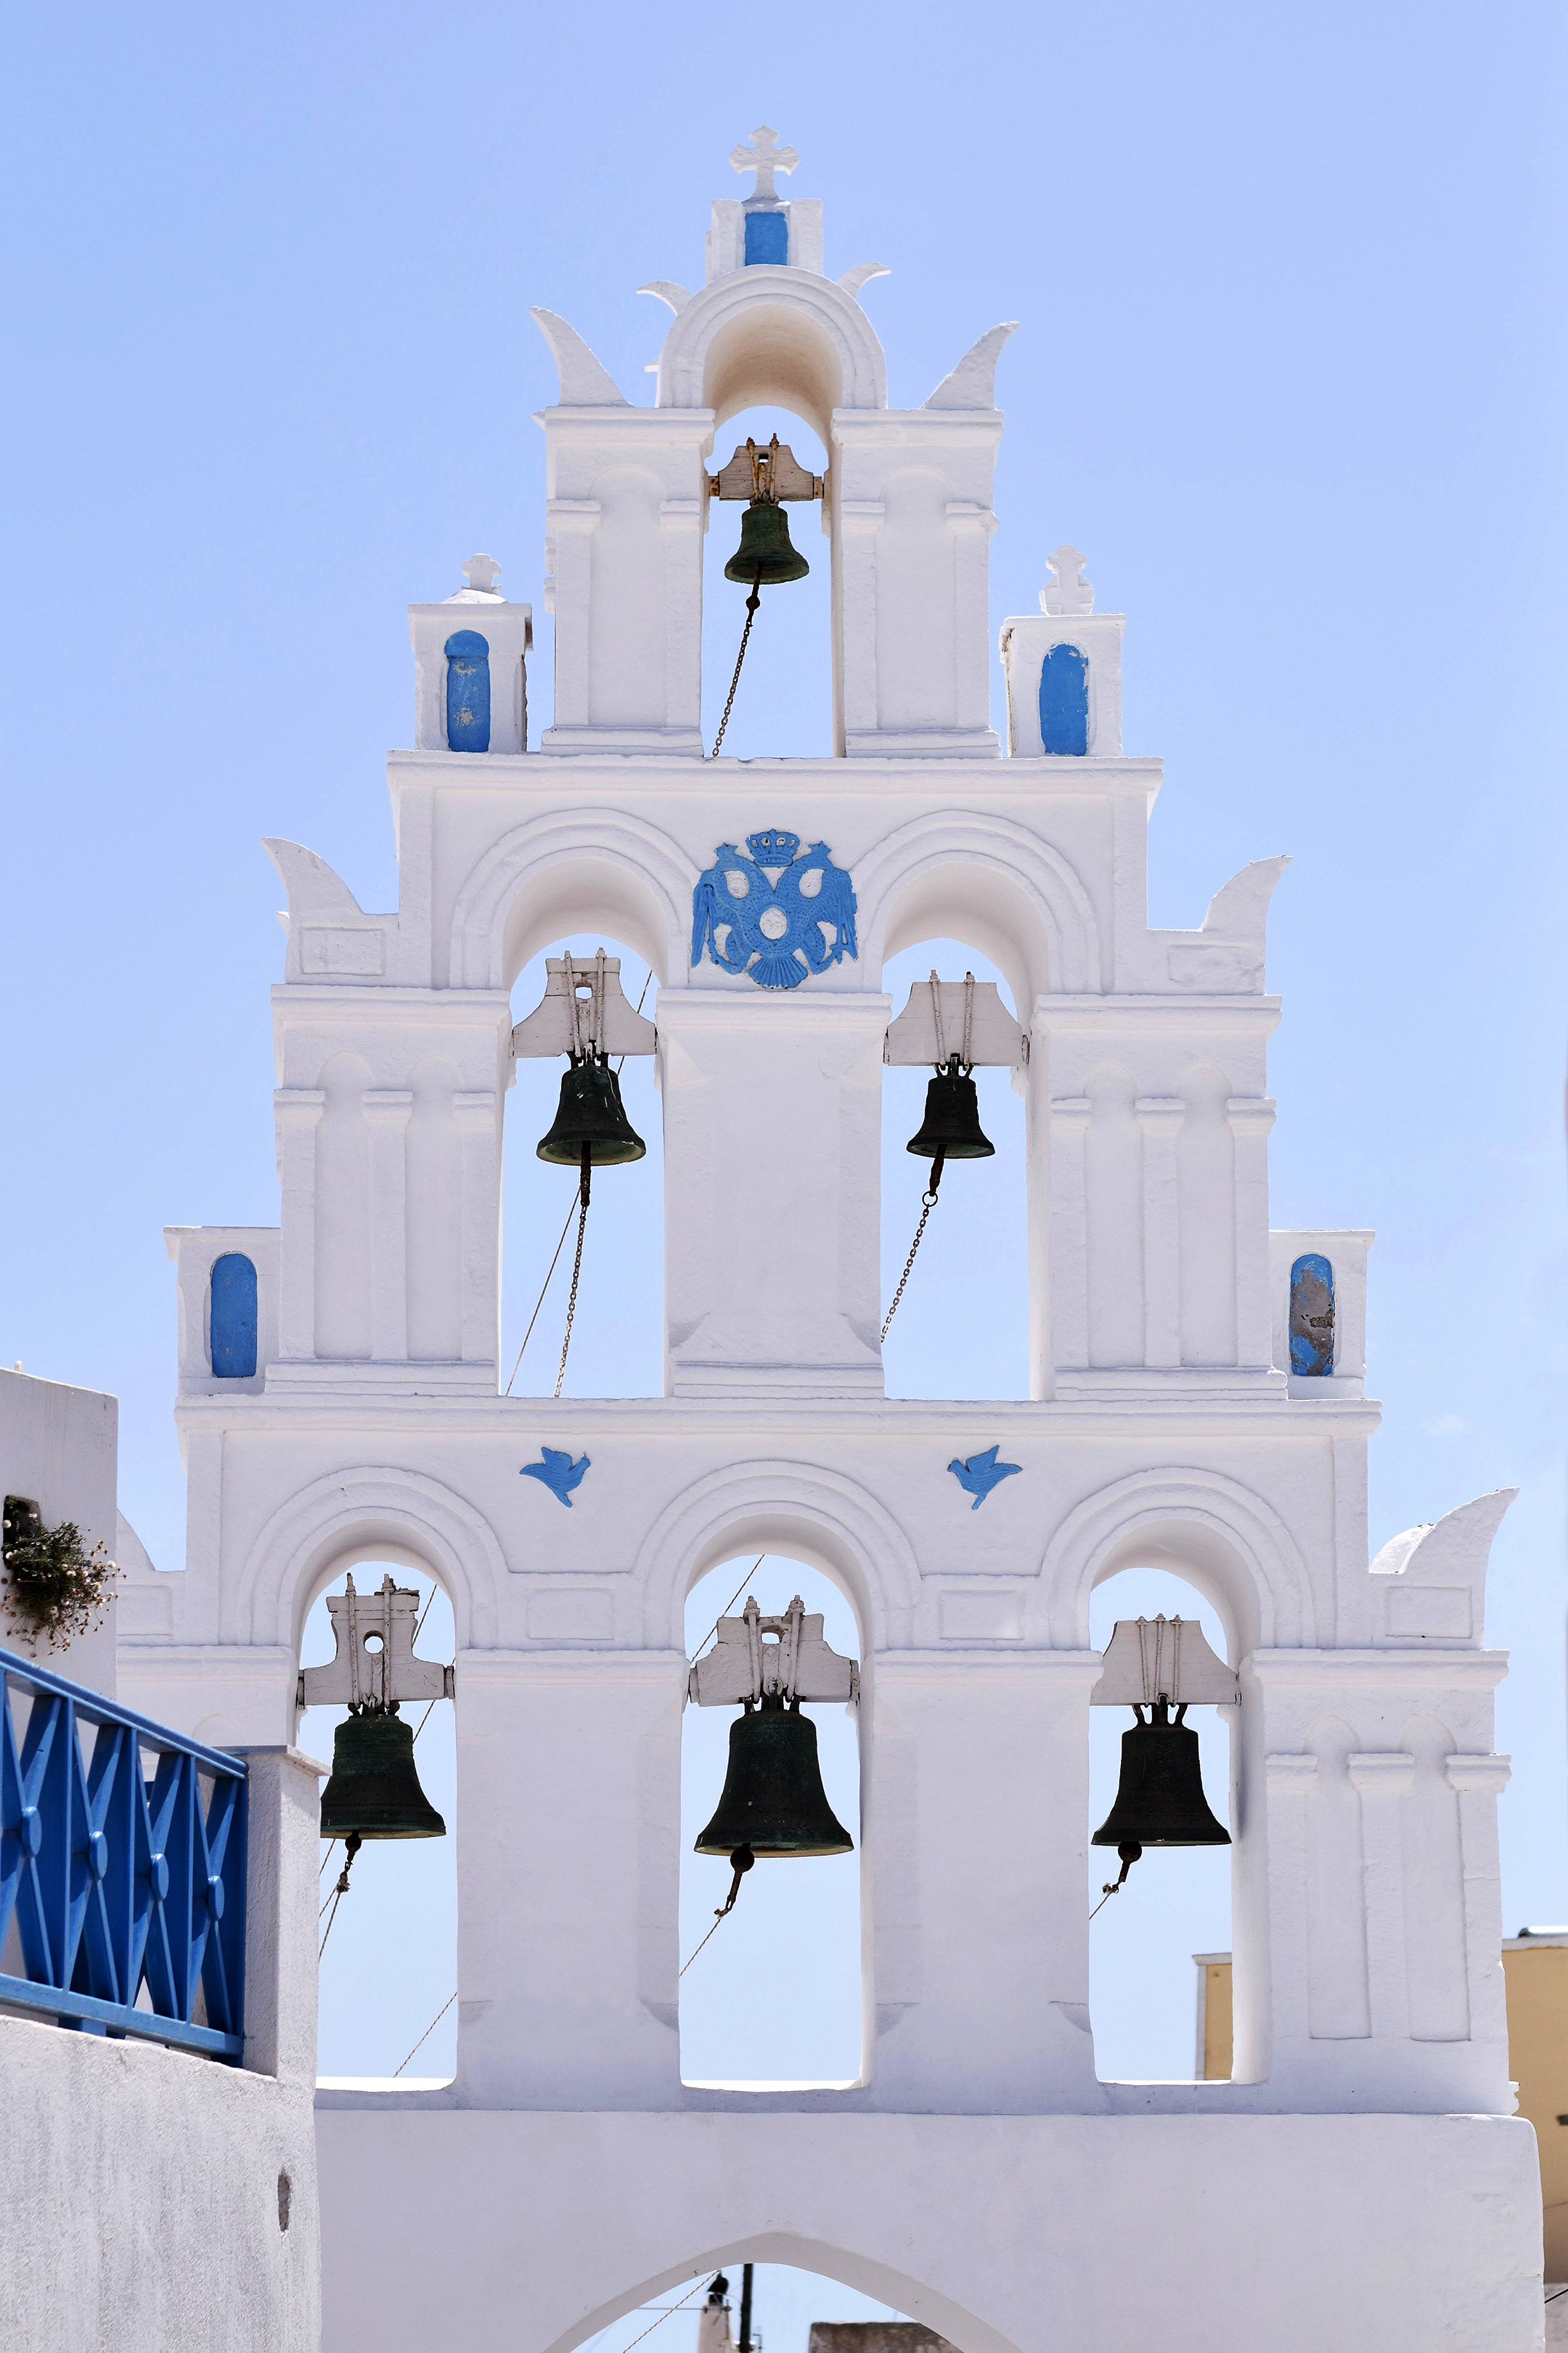 The bell tower in Megalochori, Santorini